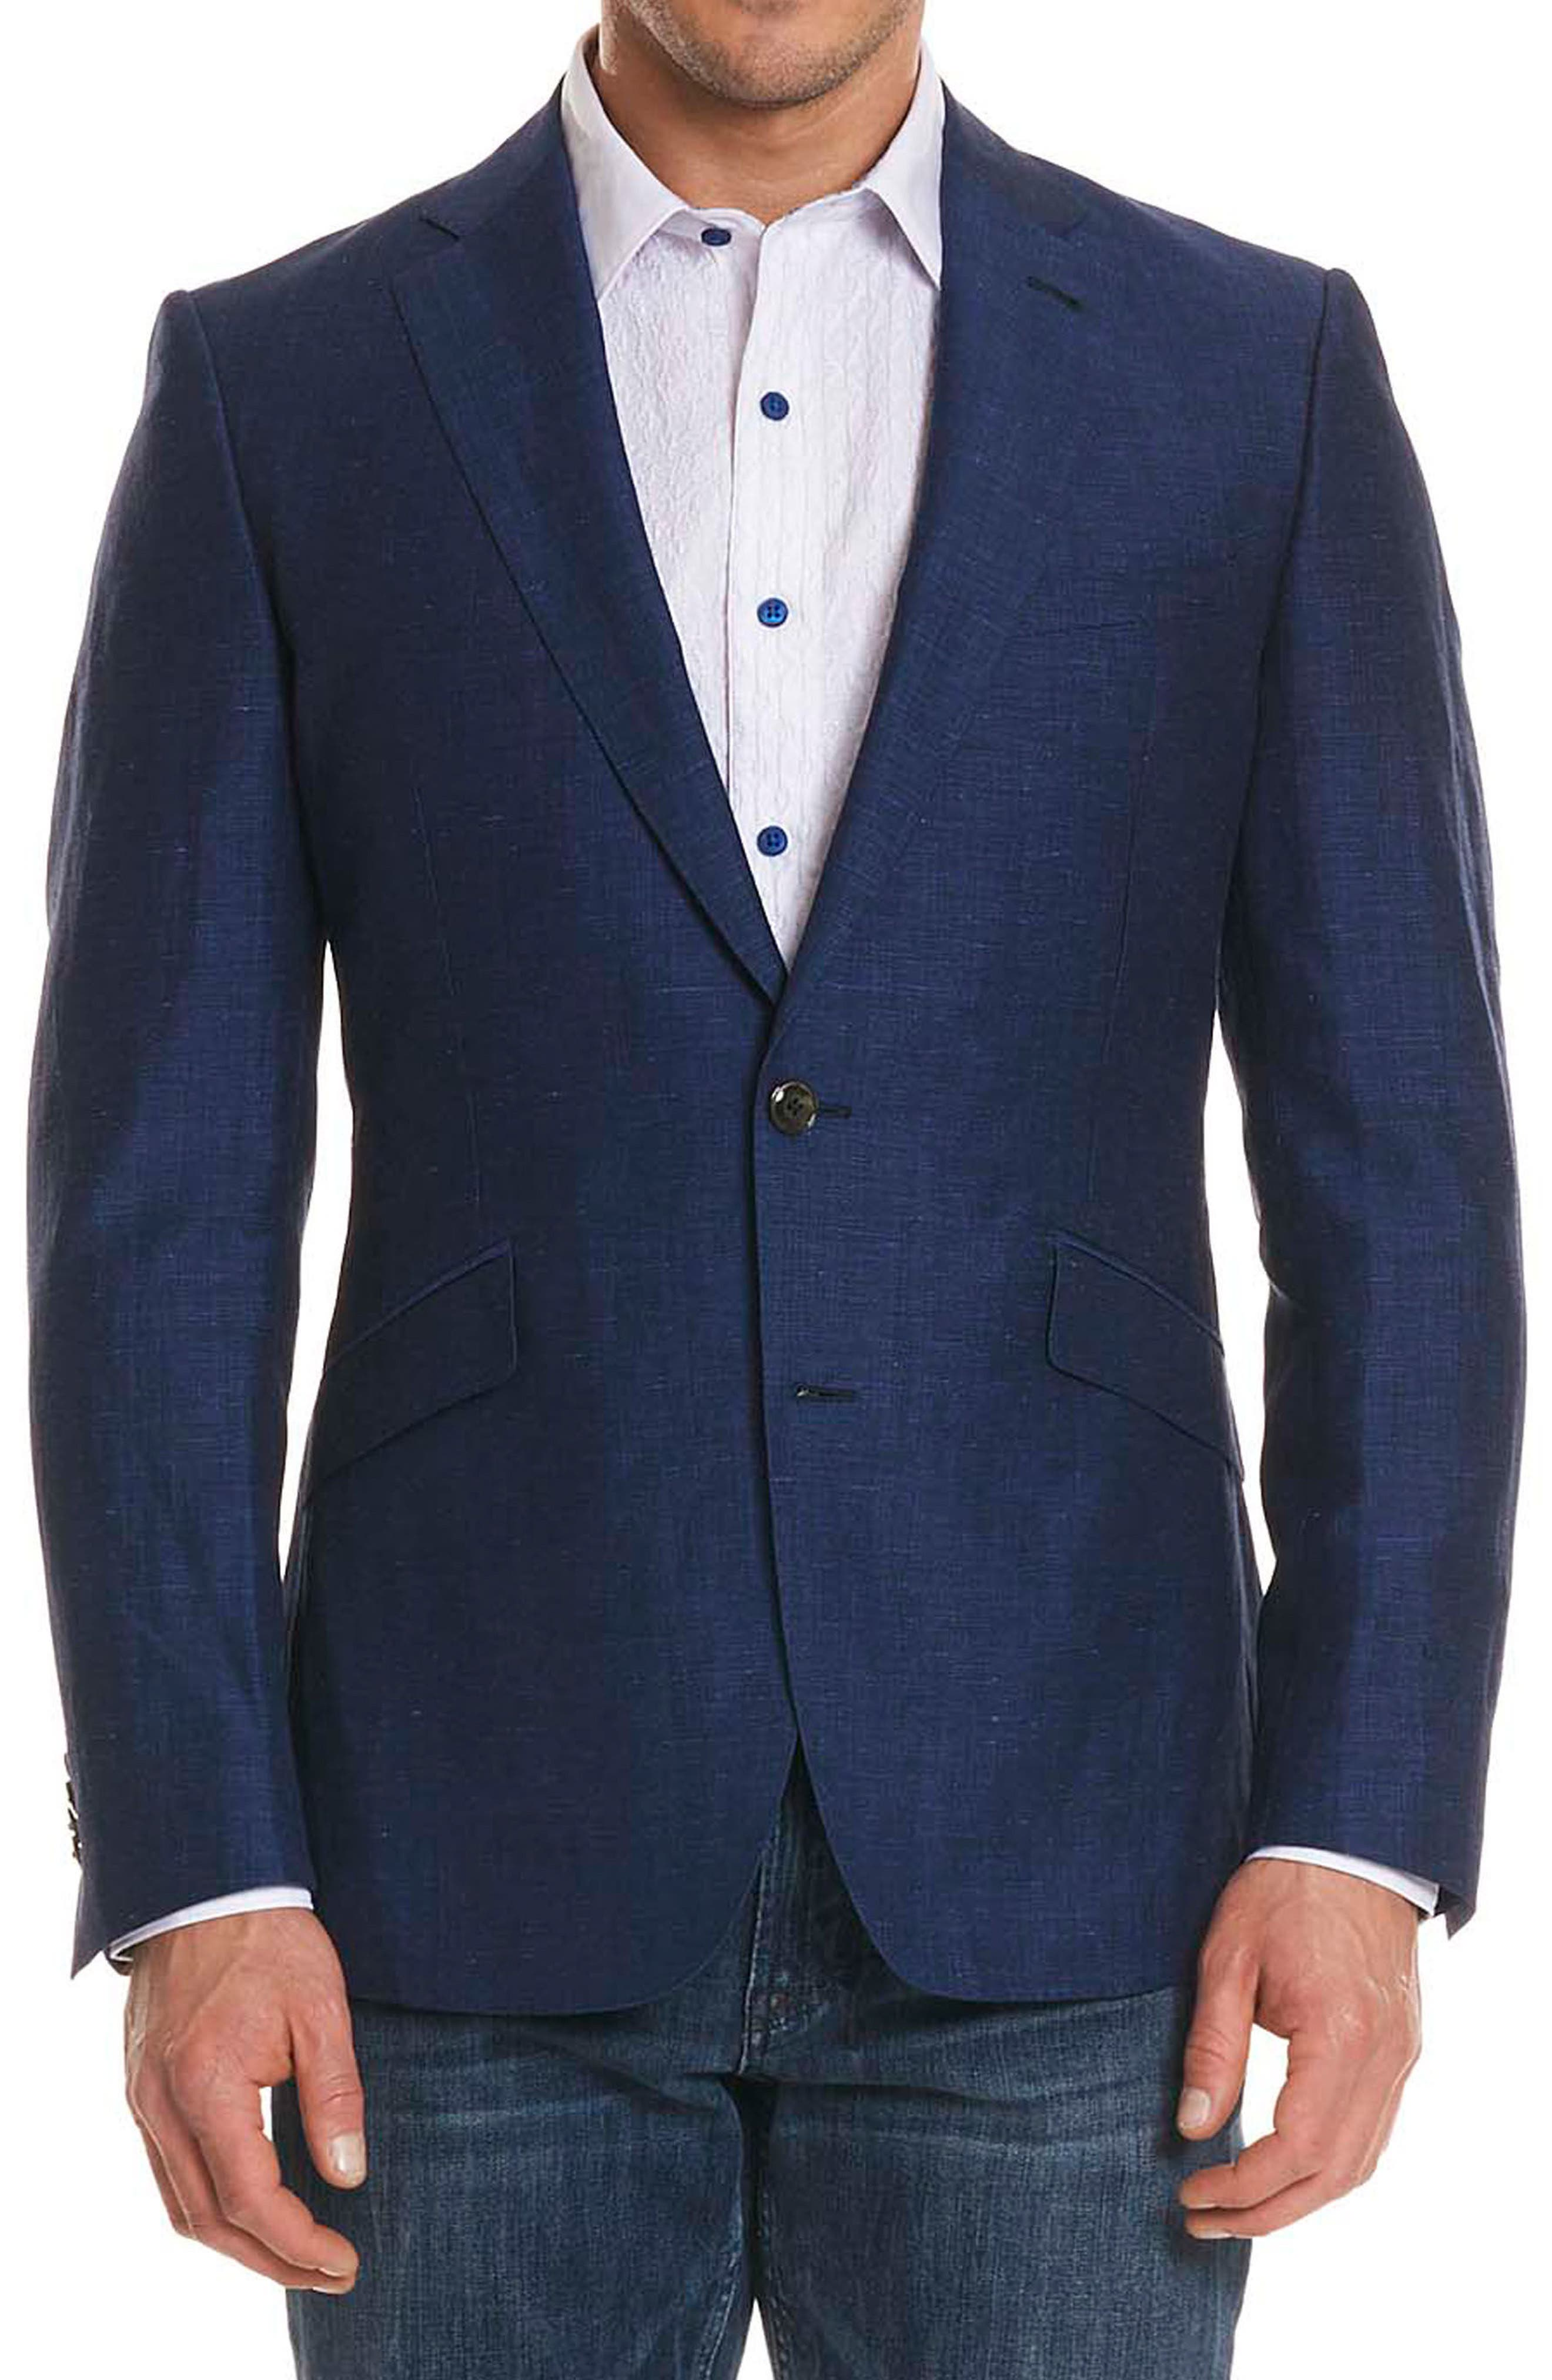 Robert Graham Vidin Tailored Fit Linen & Wool Sportcoat